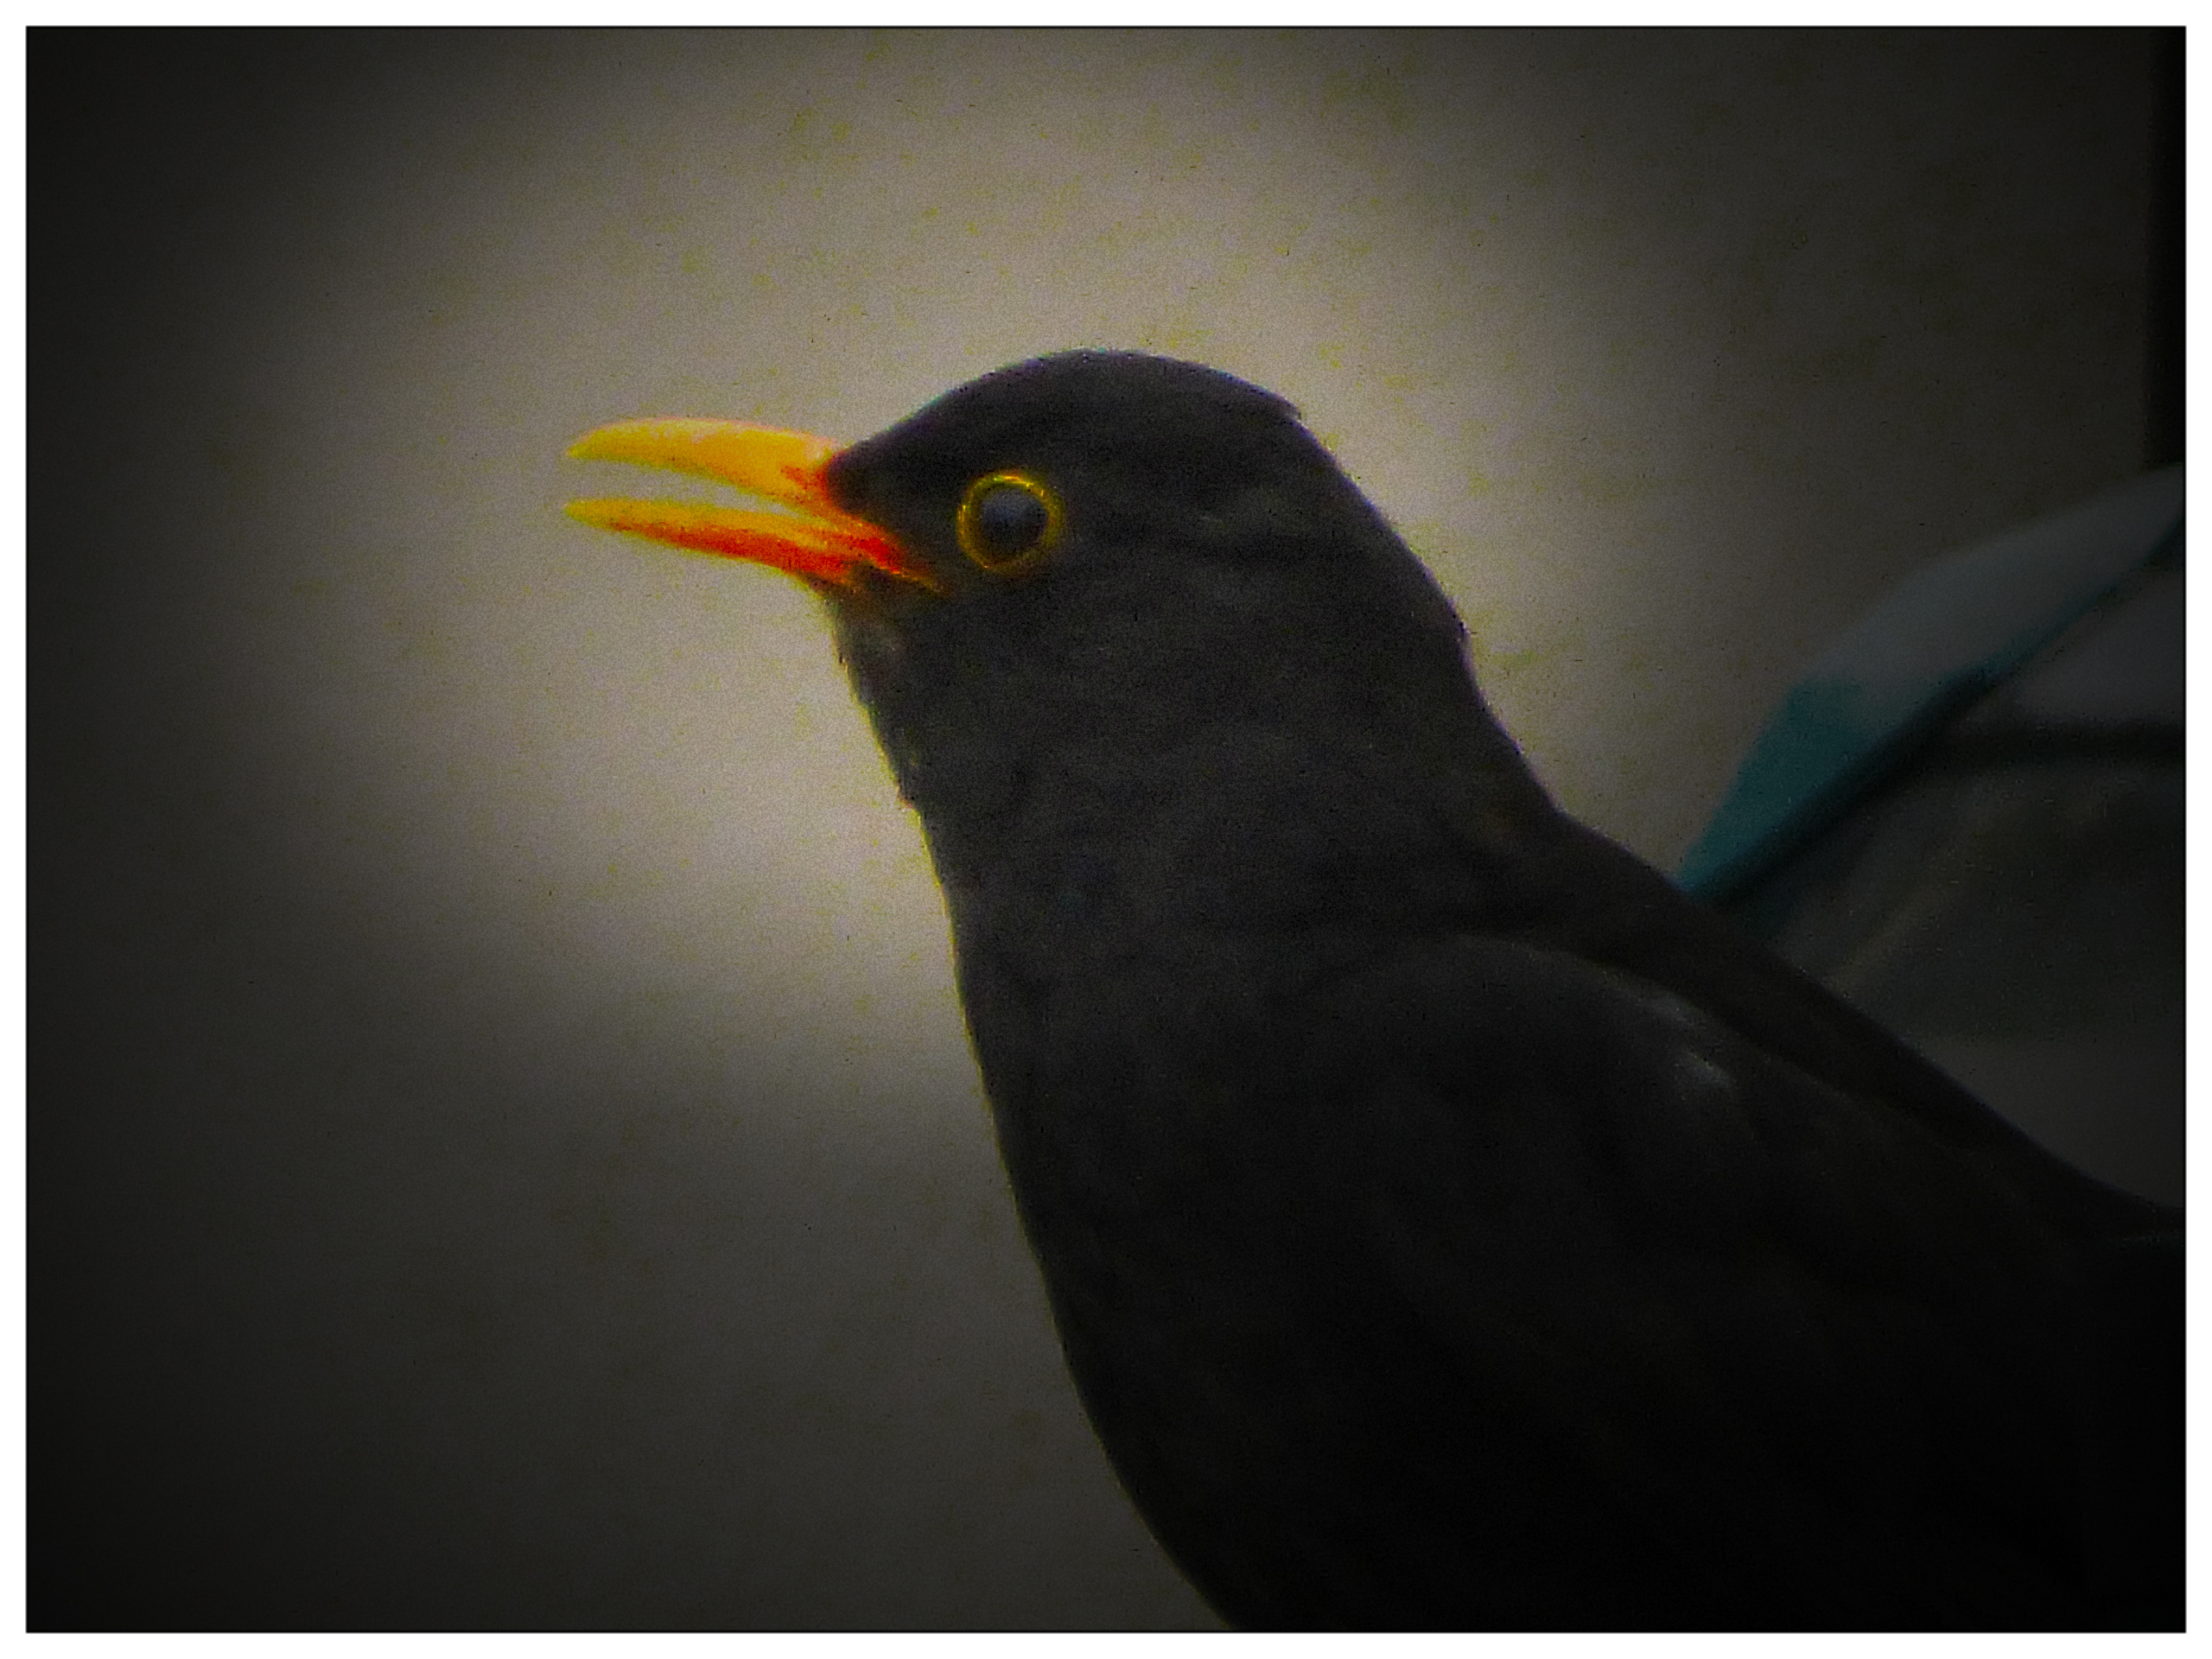 vogel_zaun